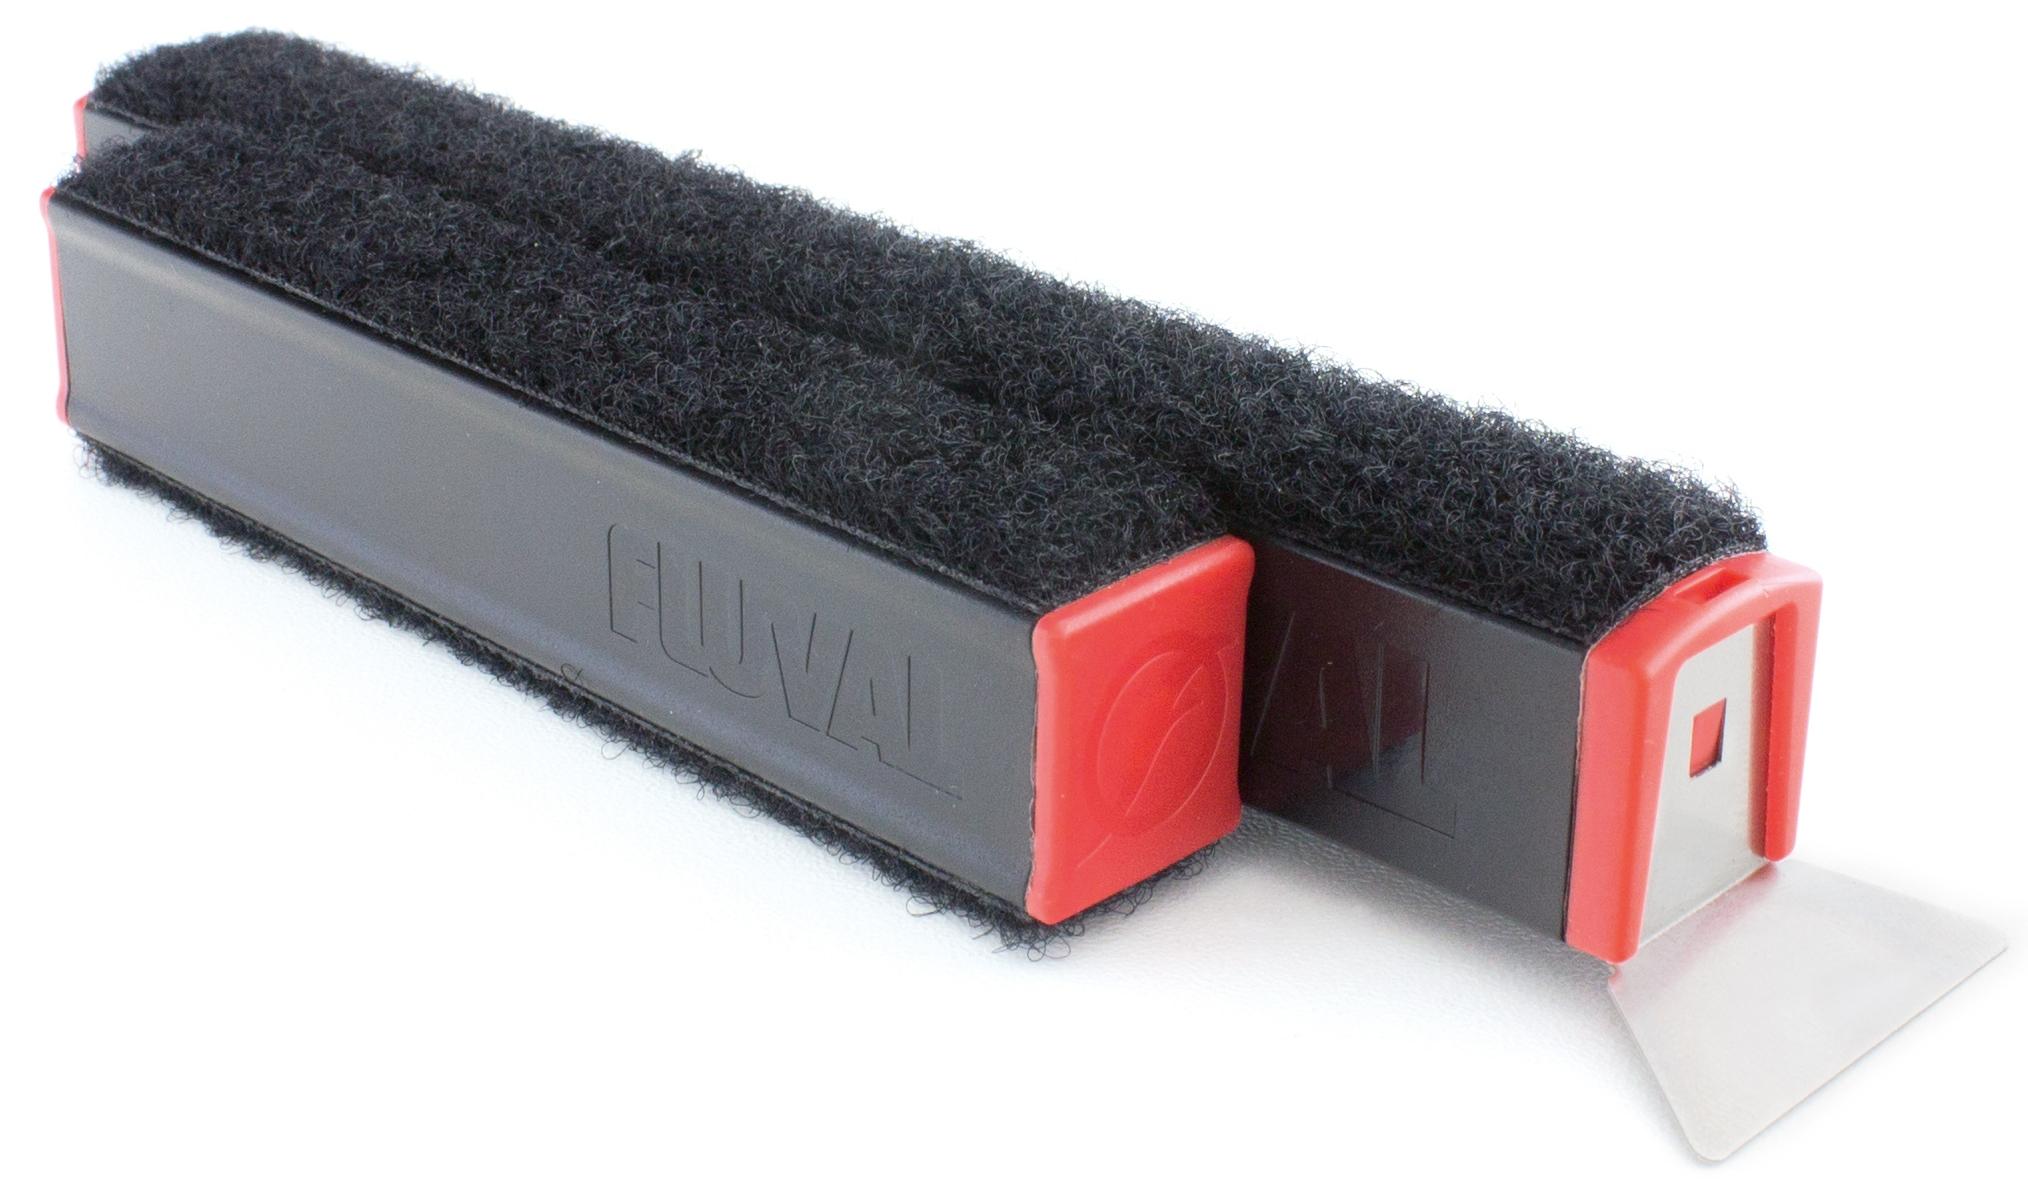 Shop Fluval Razor+ M -Algae cleaner with blade-